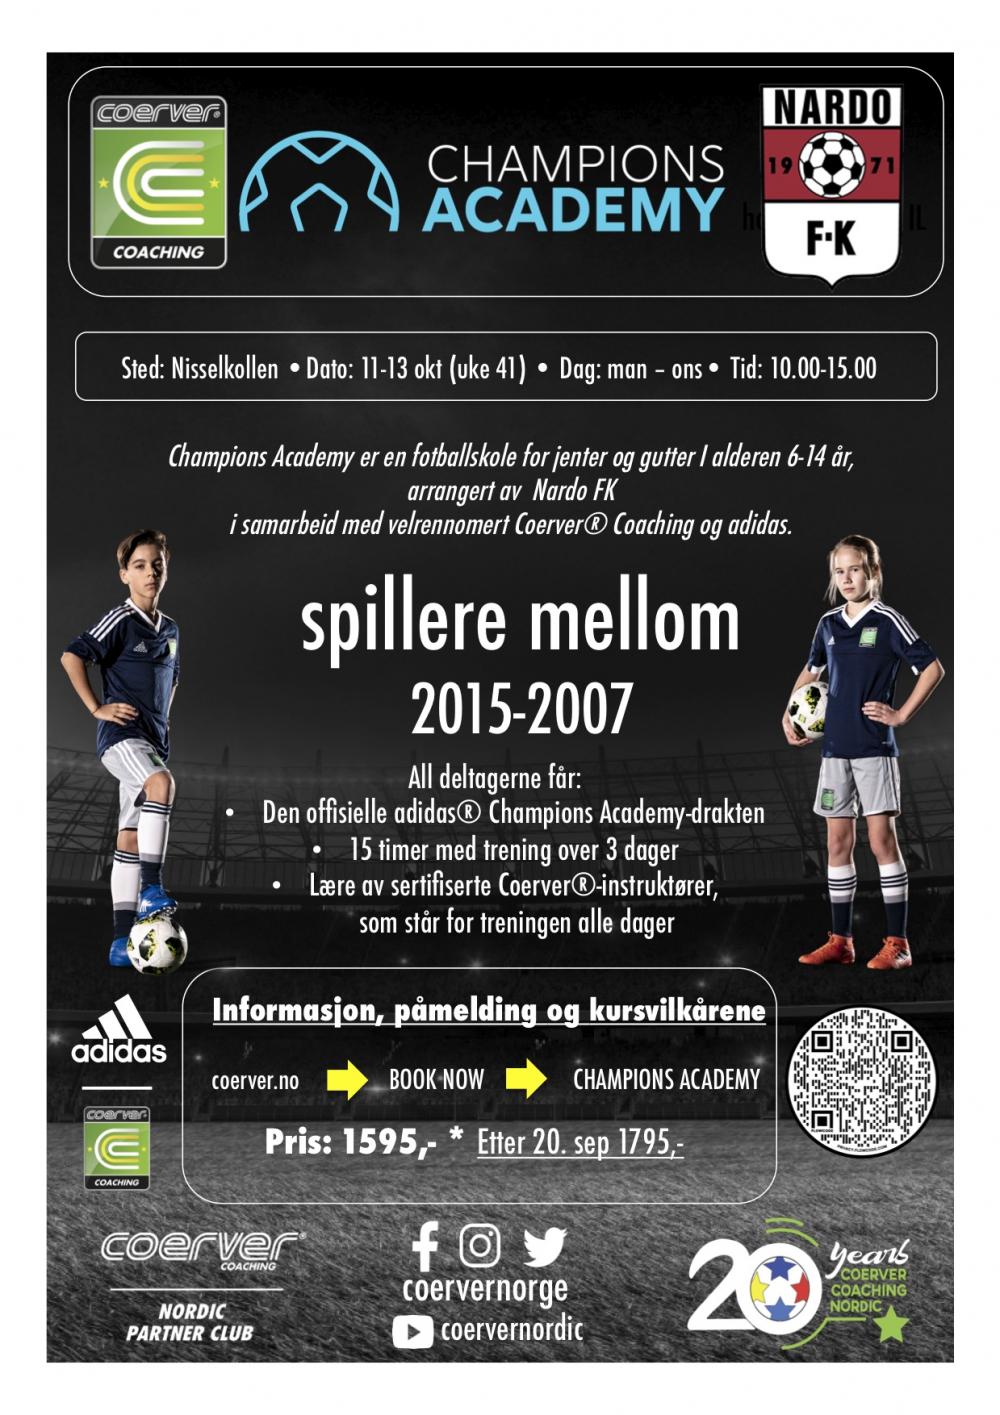 Champions Academy hos Nardo FK 2021